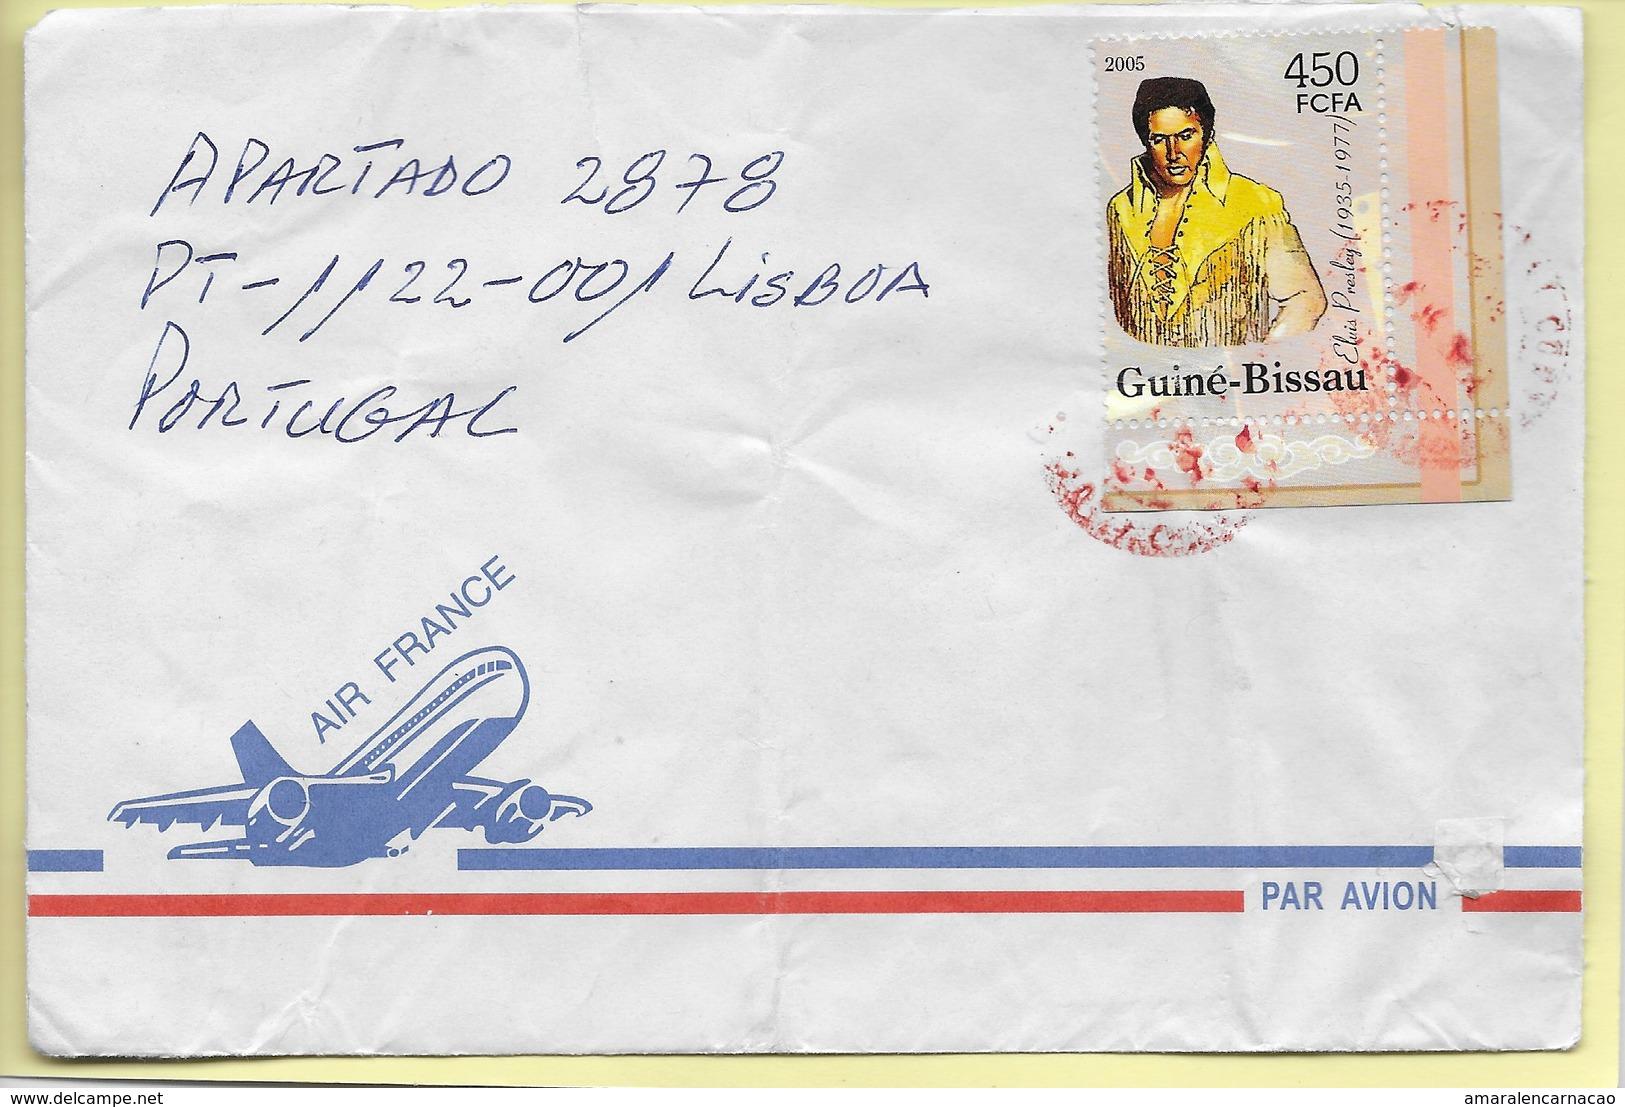 TIMBRES - STAMPS - LETTRE POUR PORTUGAL- GUINÉE-BISSAU / GUINEA-BISSAU - 2005 - CHANTEUR ELVIS PRESLEY - Elvis Presley